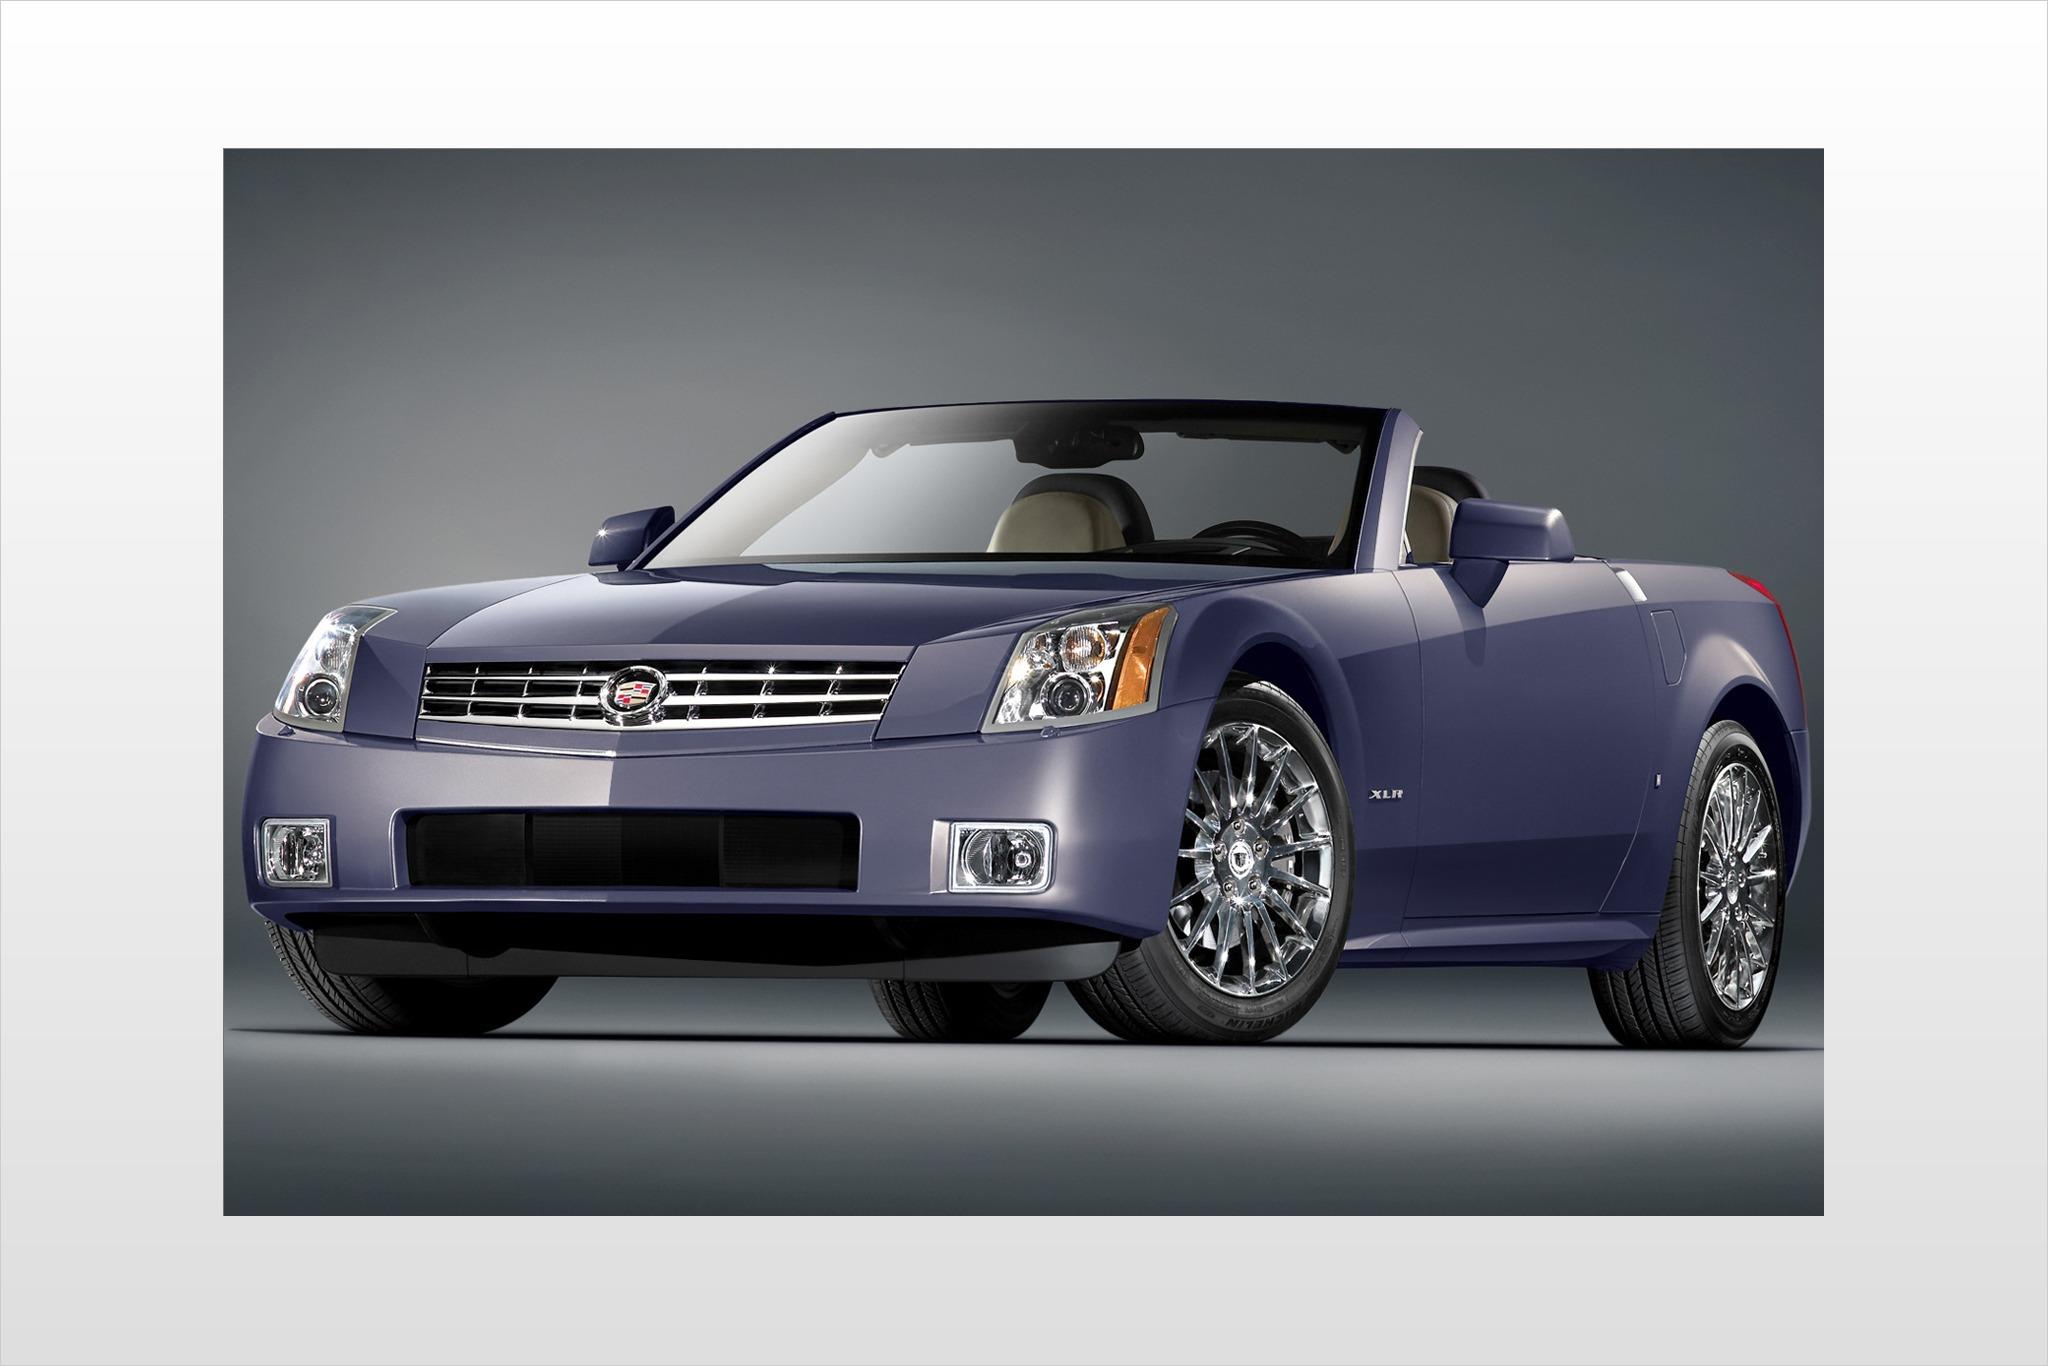 2008 Cadillac Xlr 3 Convert Exterior